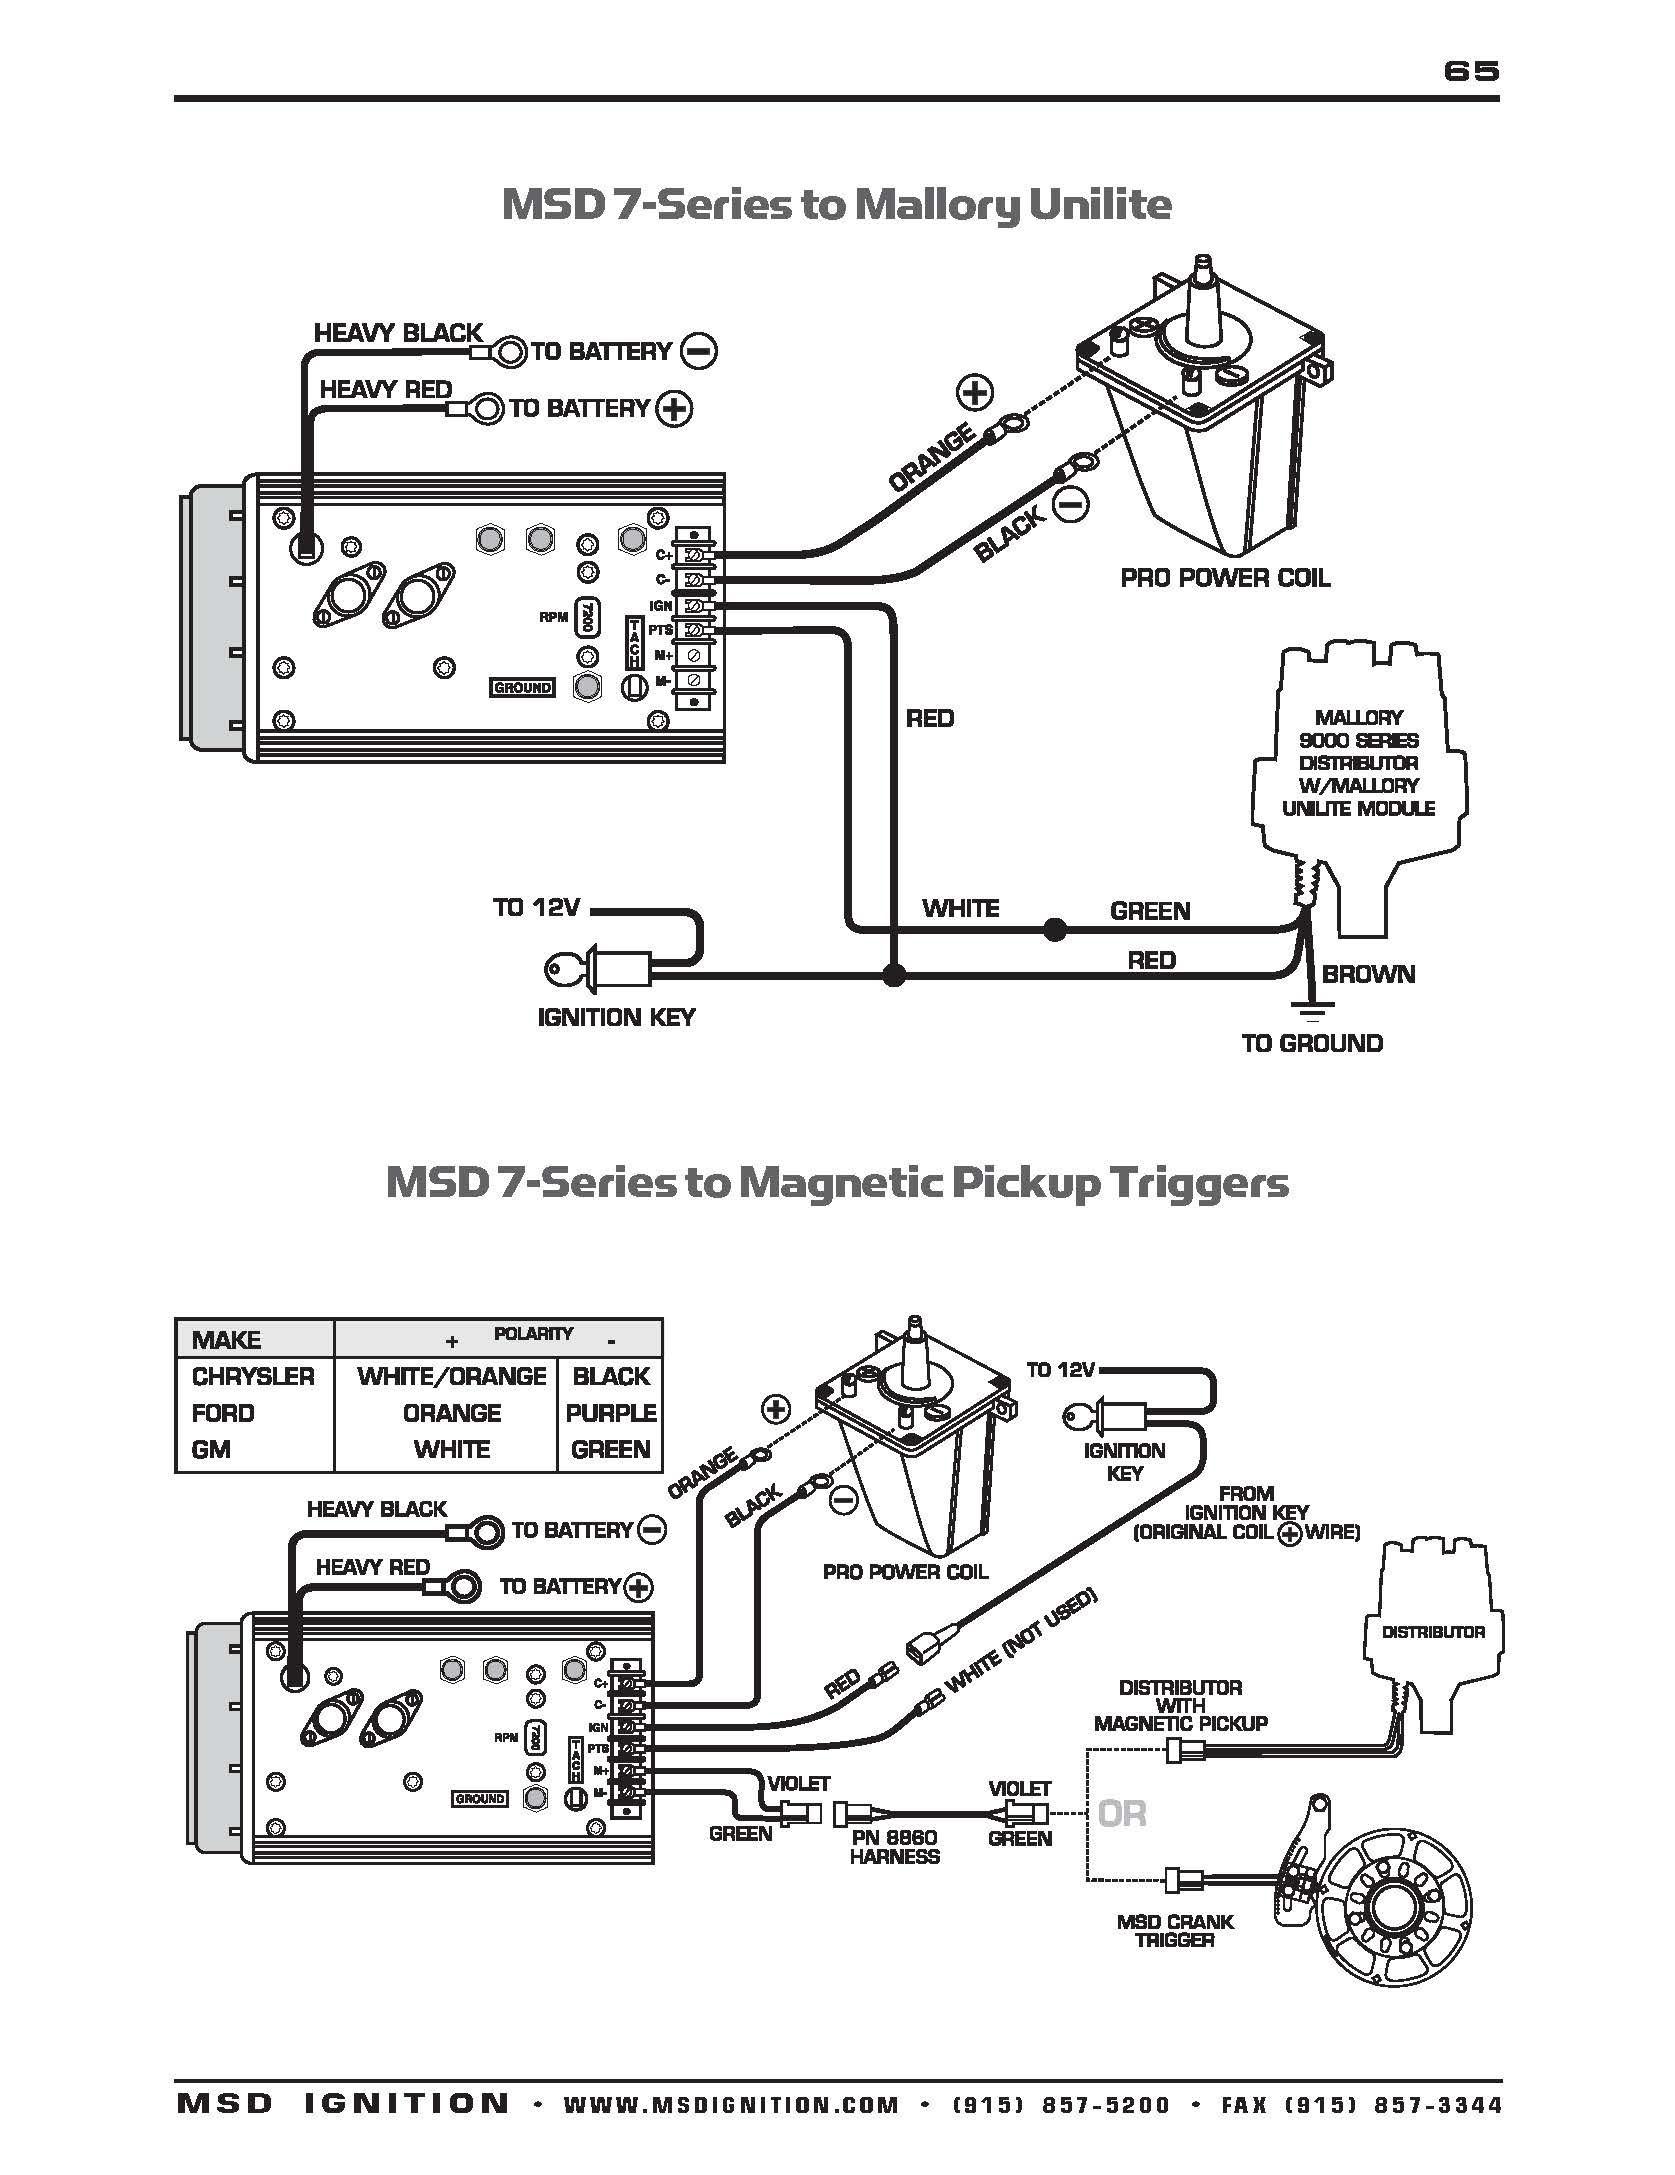 msd wiring gm illustration of wiring diagram \u2022 2001 chevy s10 wiring harness diagram msd 8860 wiring harness diagram gm wiring diagram u2022 rh tinyforge co msd 6a wiring diagram gm msd wiring instructions